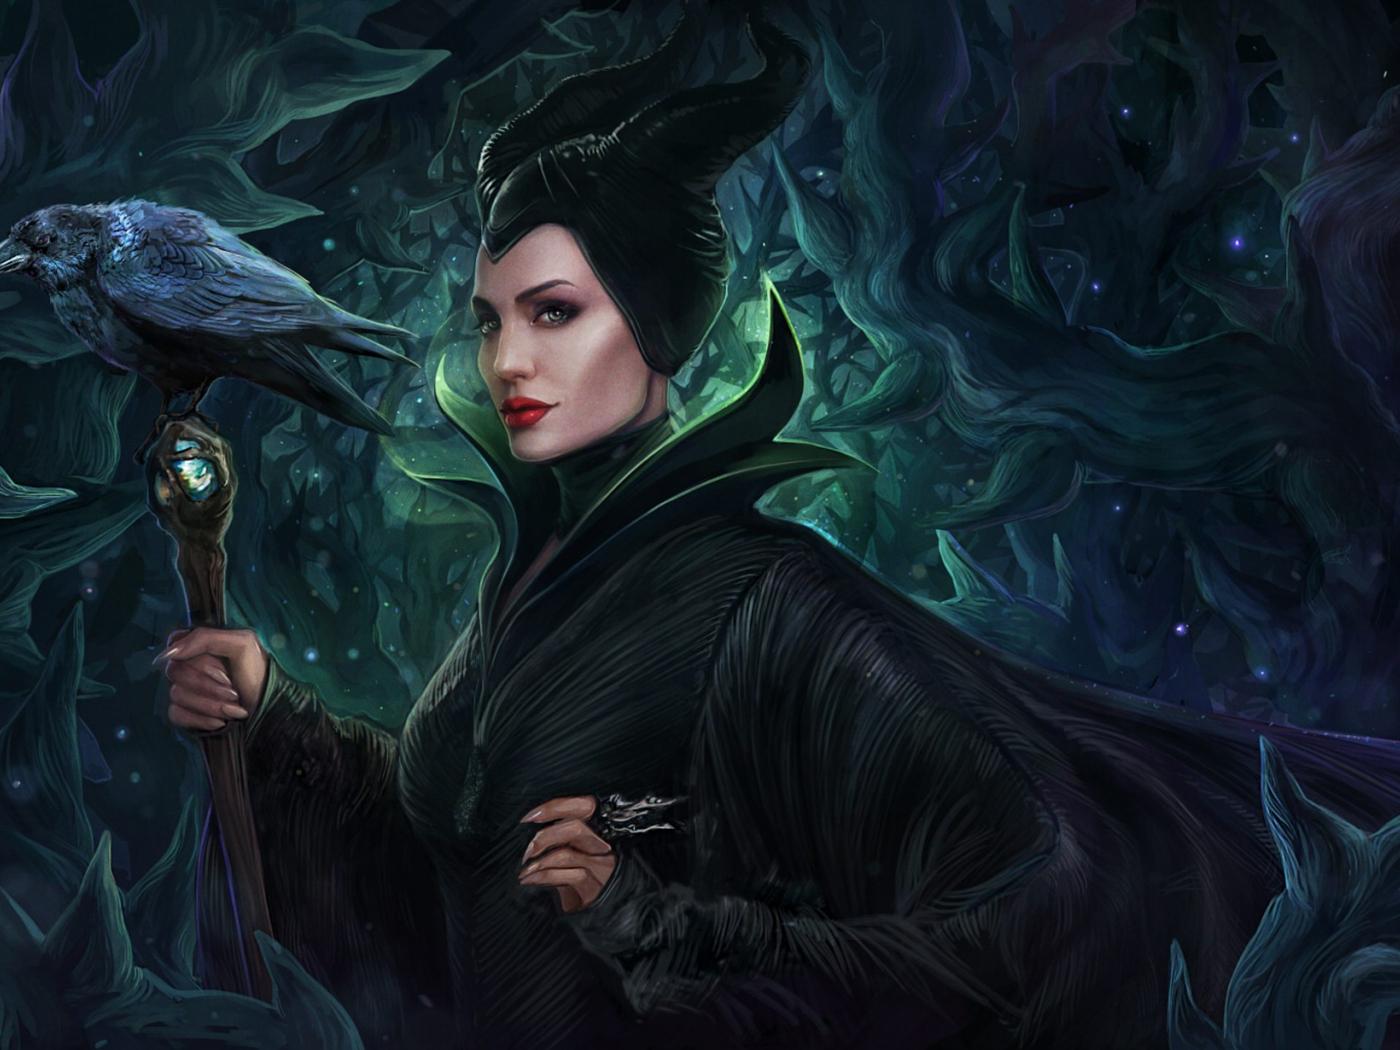 Download 1400x1050 Wallpaper Disney S Maleficent Evil Movie